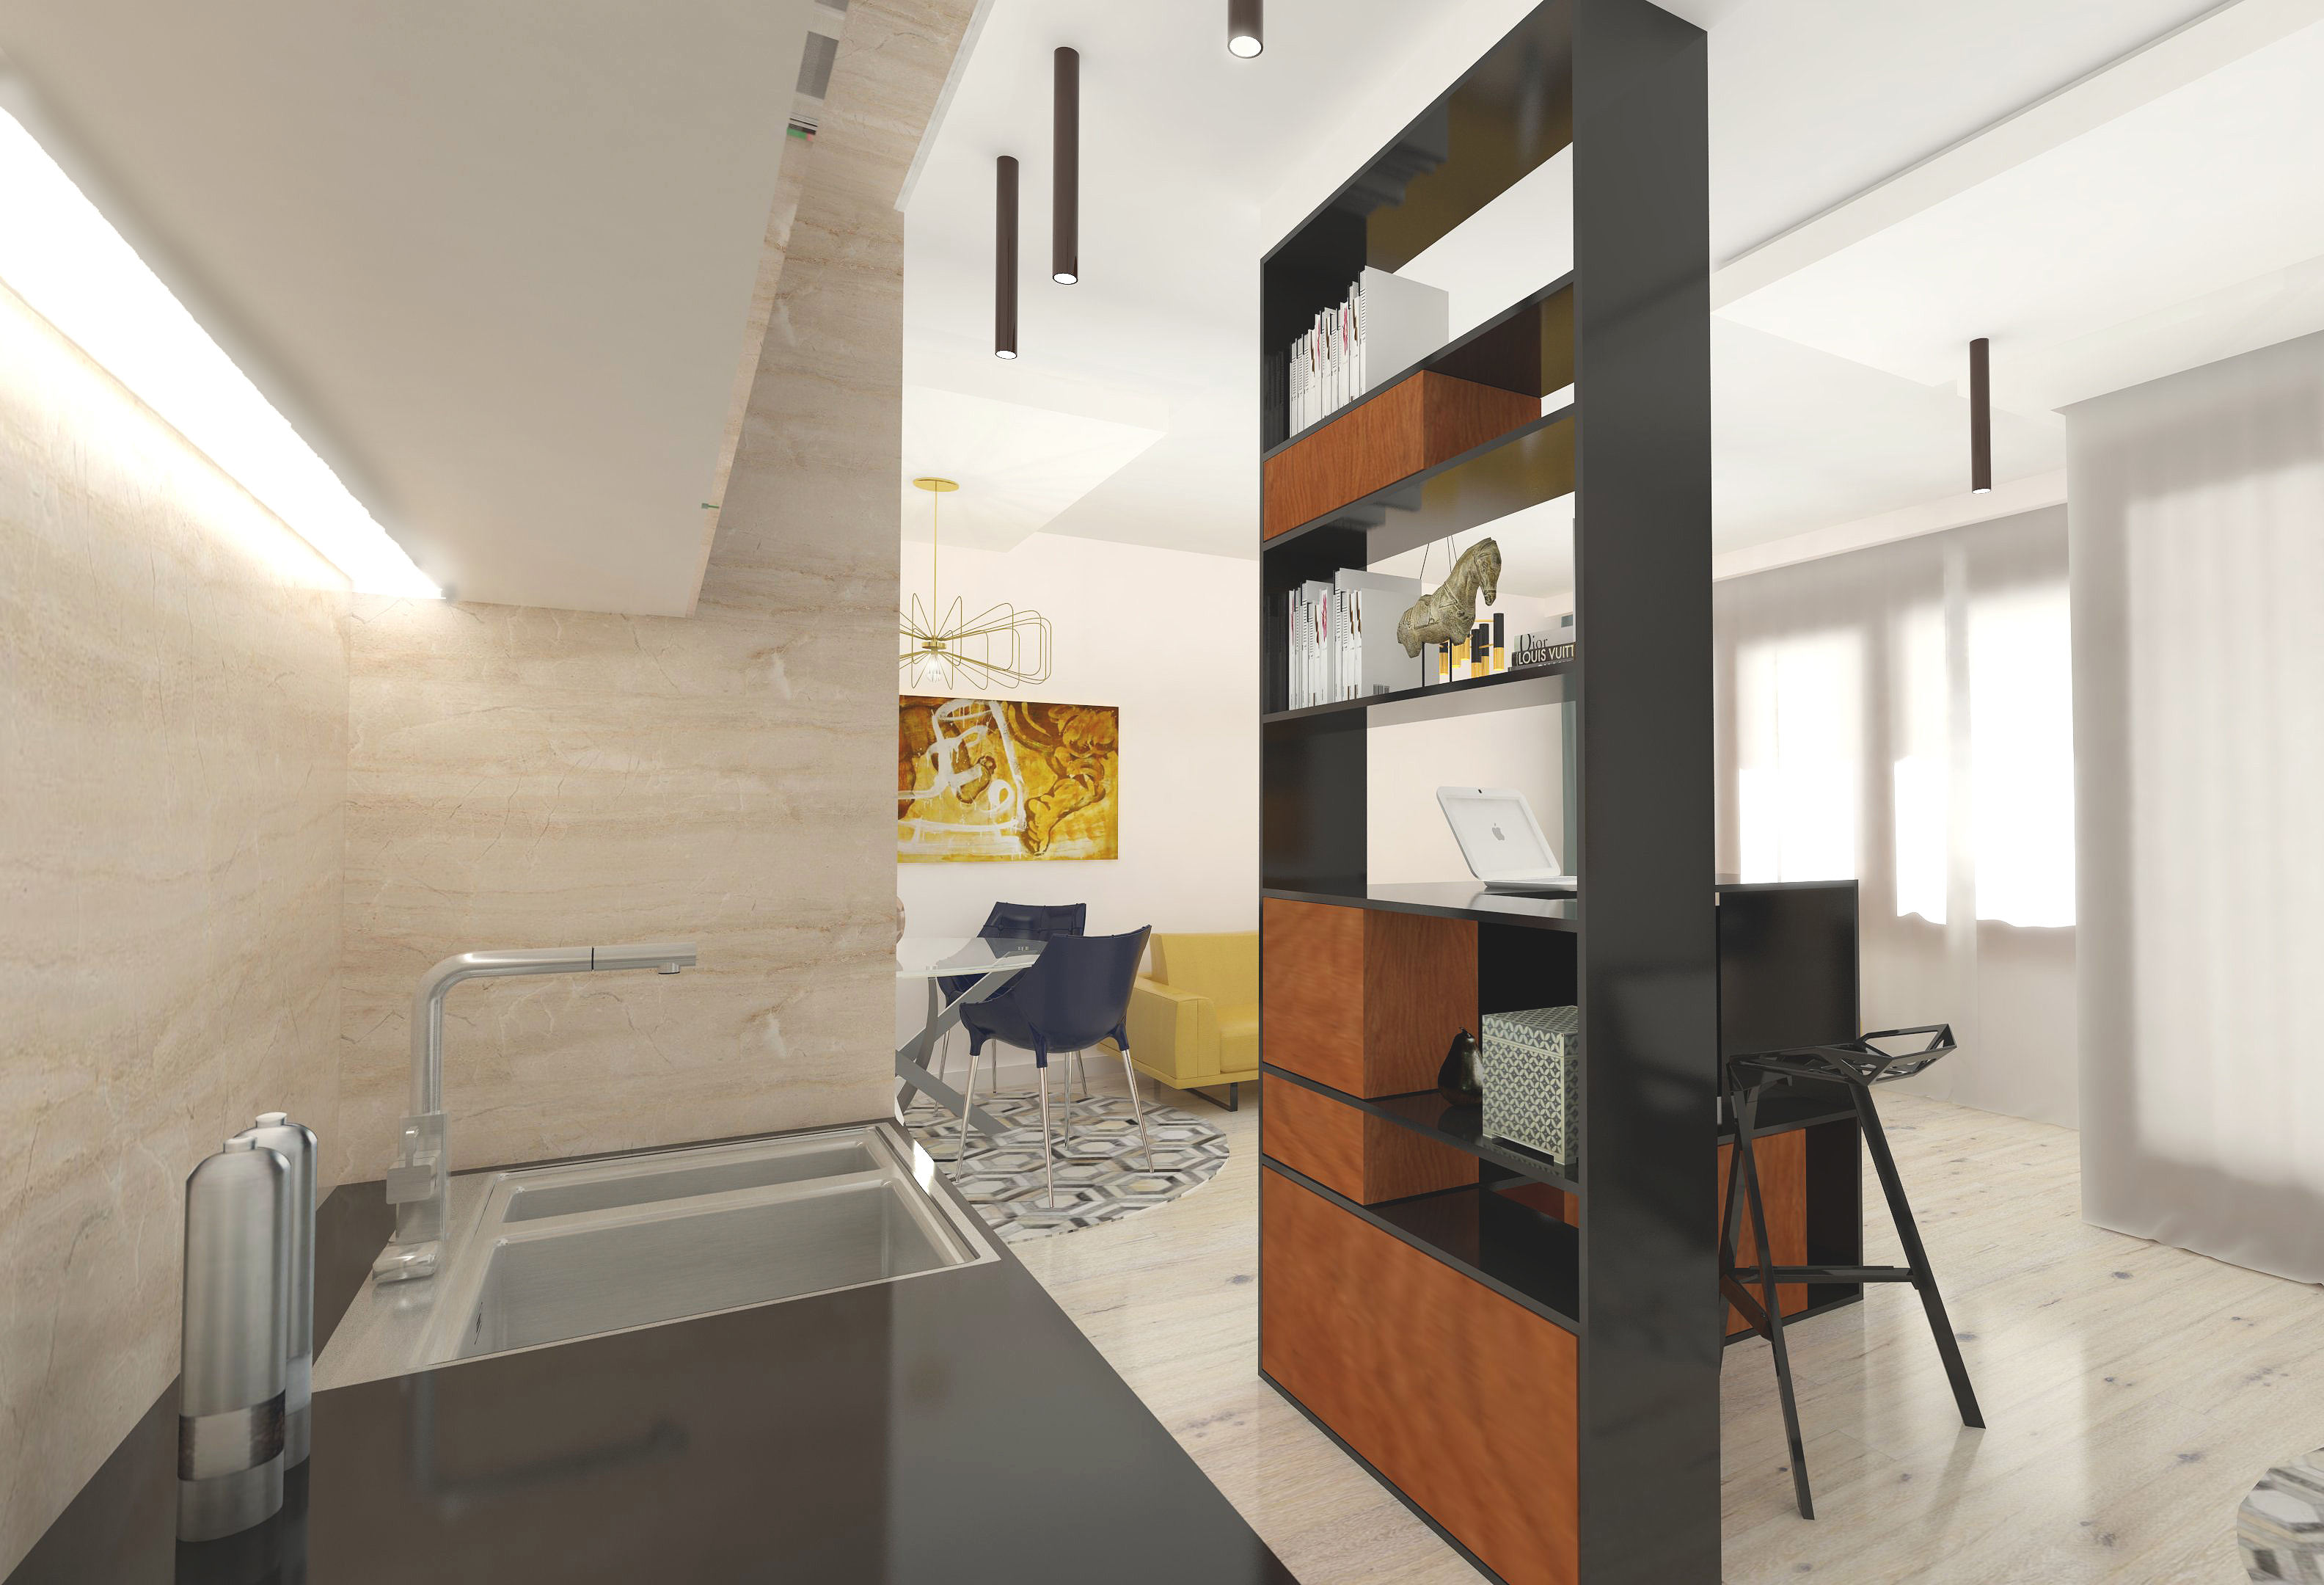 napollo group collaboration, honey, apartment, napollo, bright, spacious